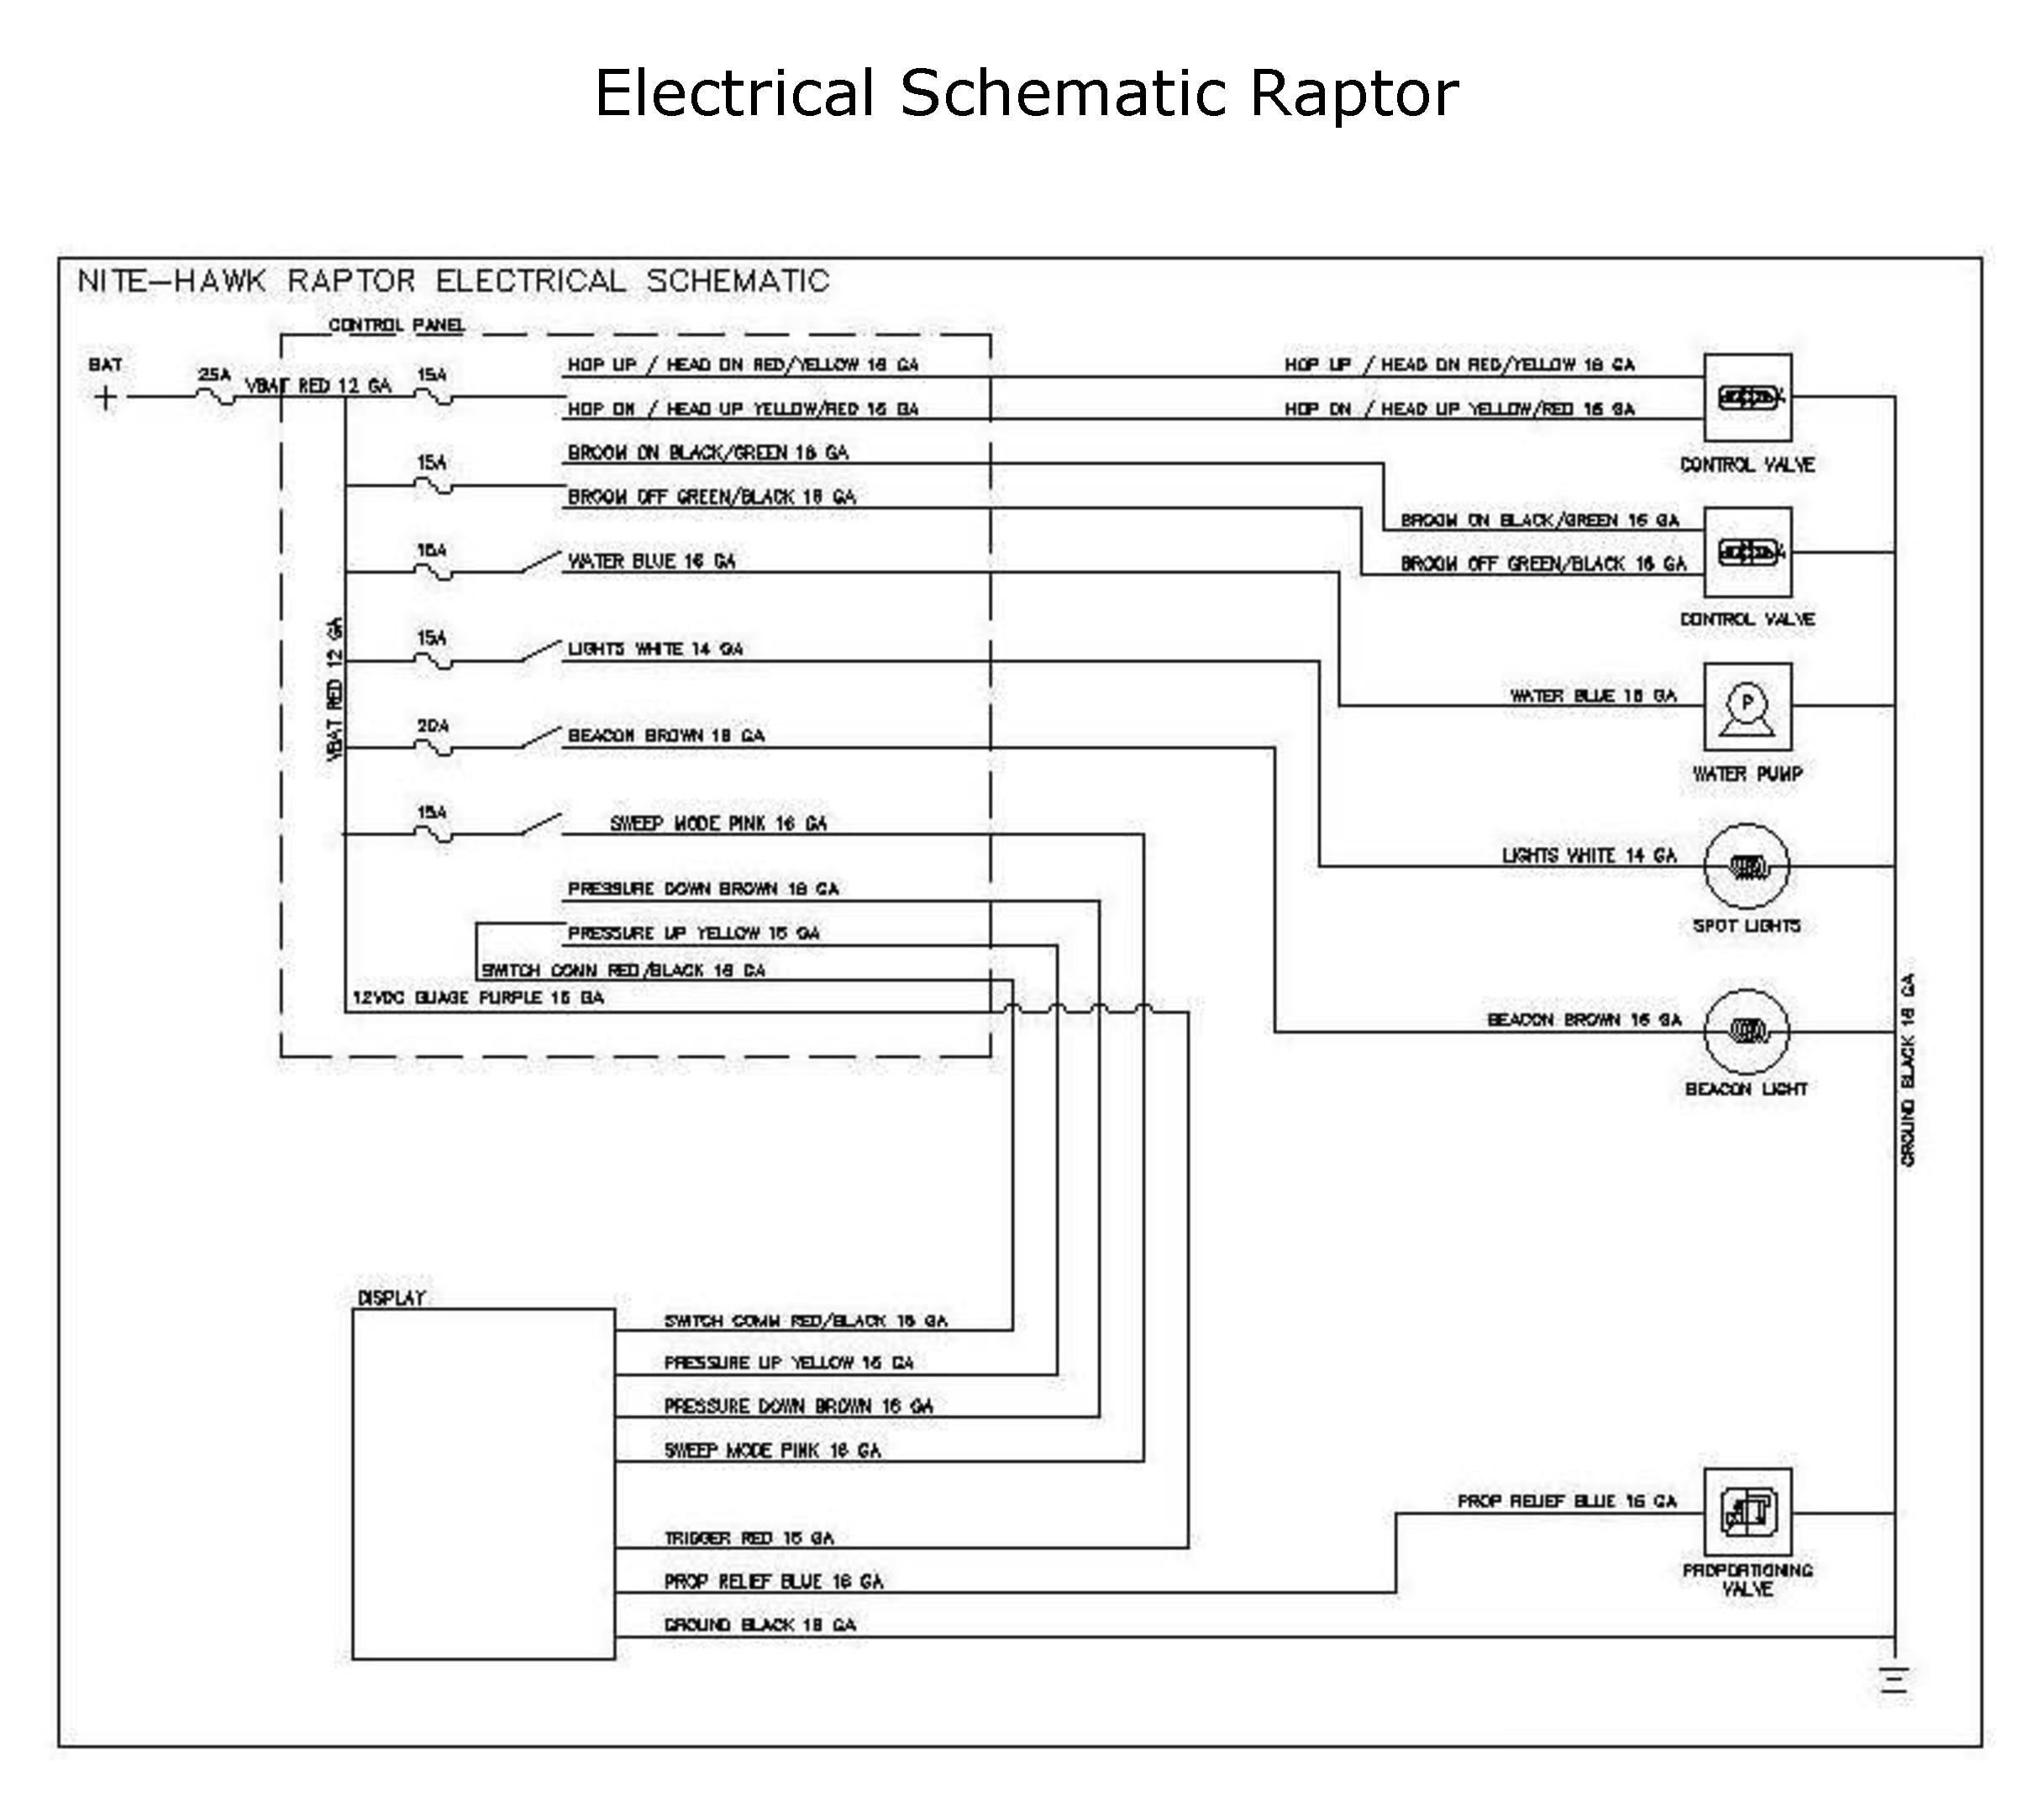 Raptor - Electrical Schematic